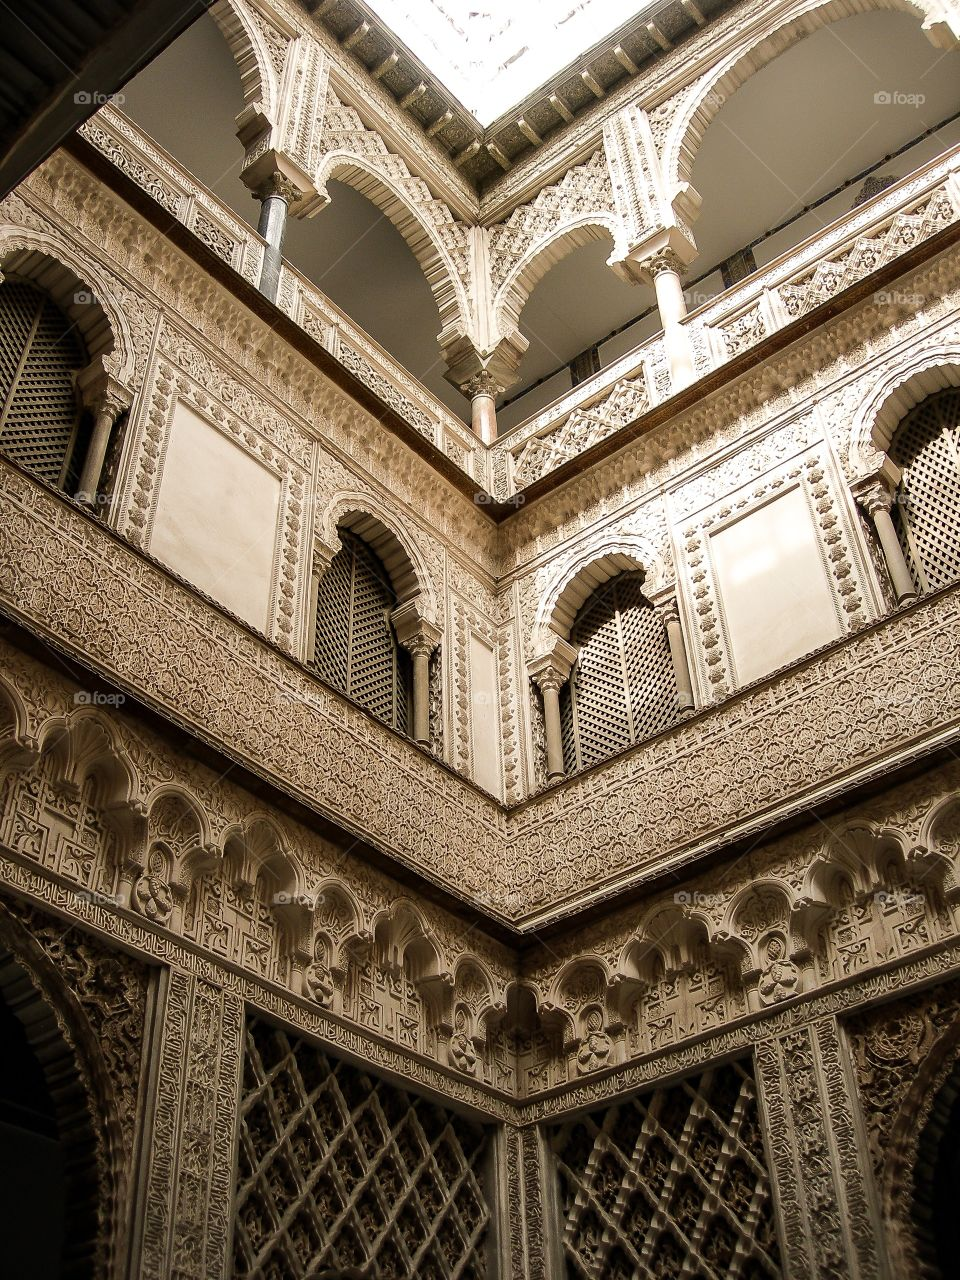 Patio de las Muñecas. Patio de las Muñecas - Reales Alcazares (Sevilla - Spain)